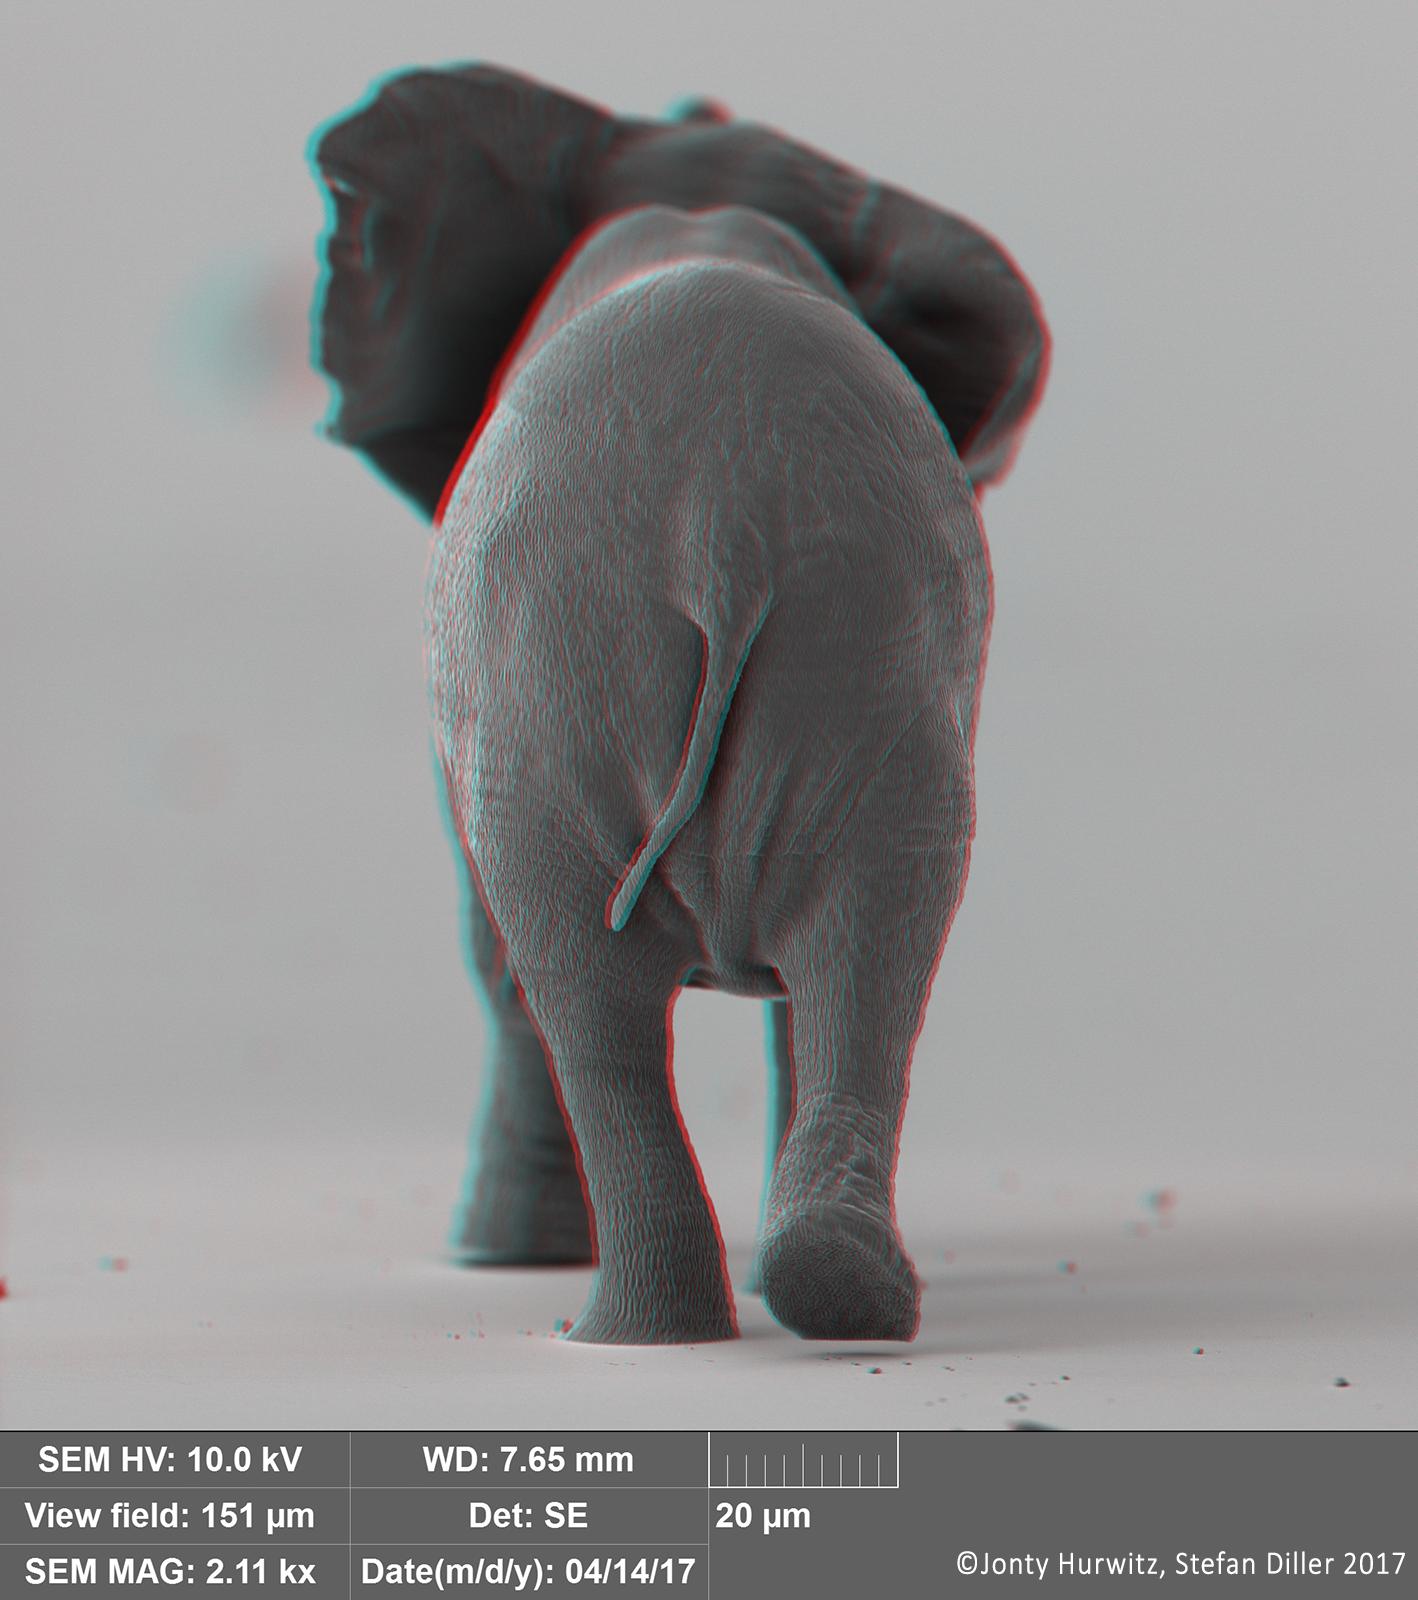 Jonty-Hurwitz-Nano-Elephant-3D-2.png